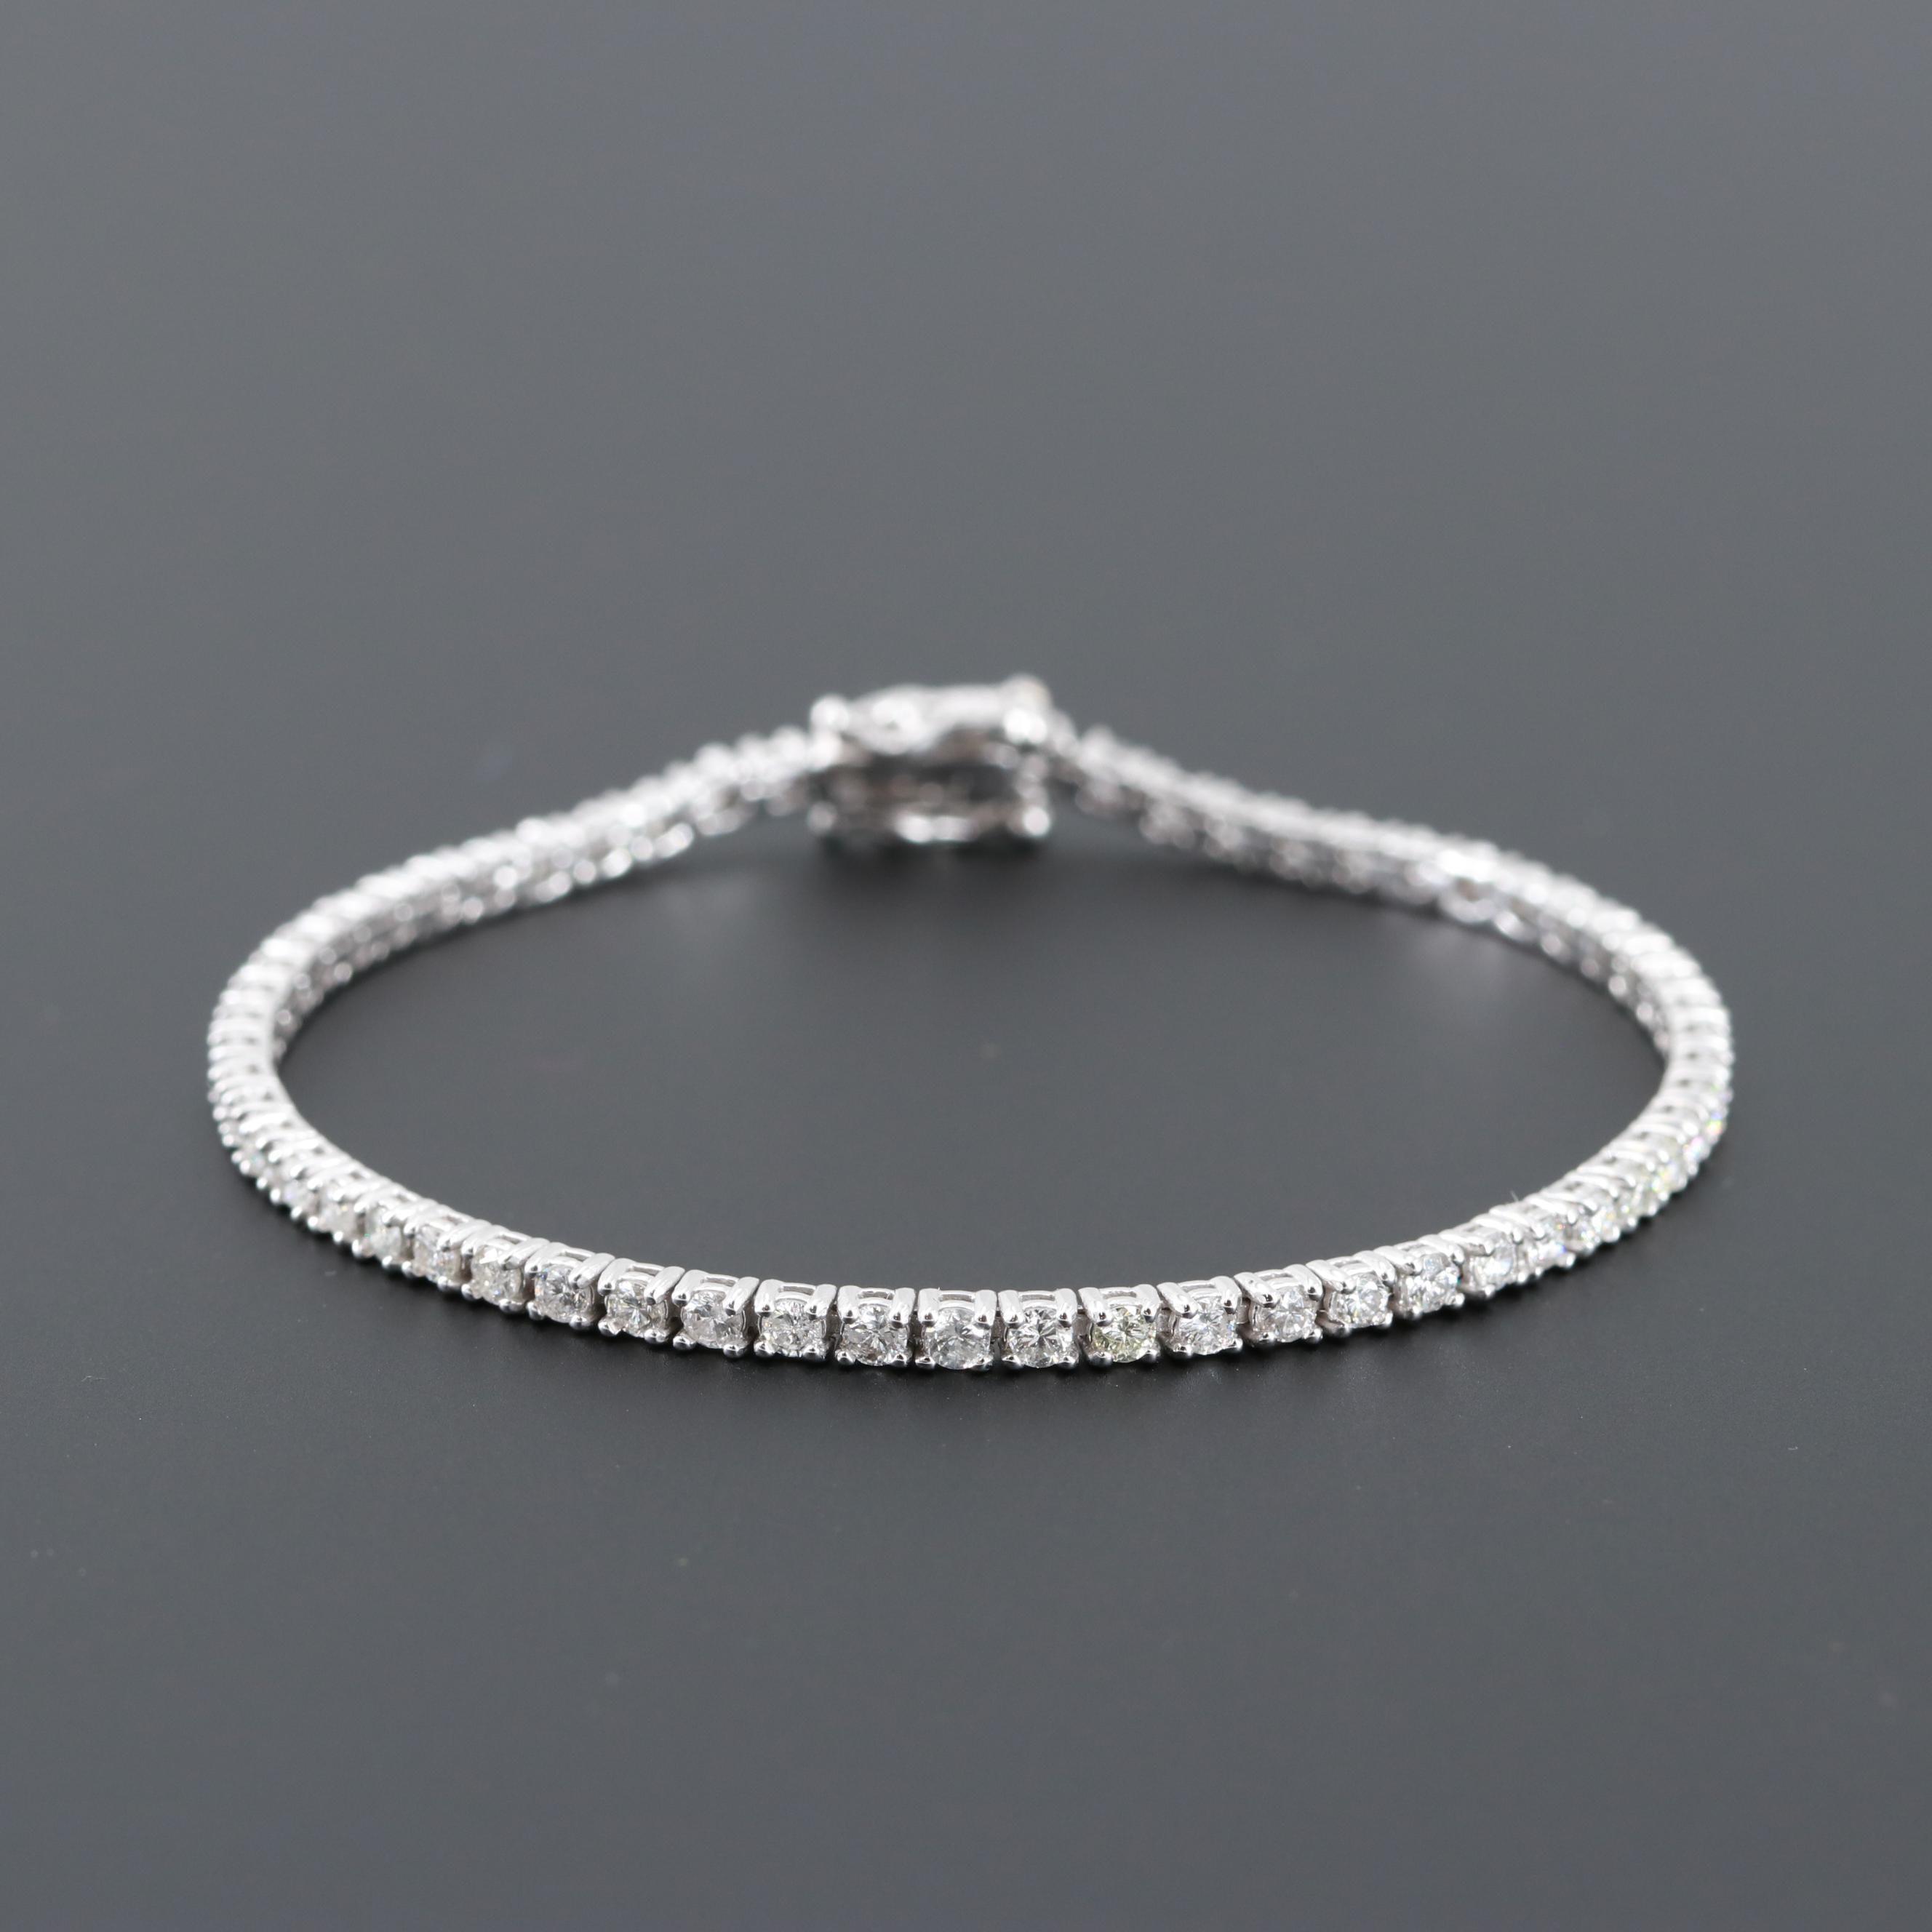 14K White Gold 2.25 CTW Diamond Tennis Bracelet